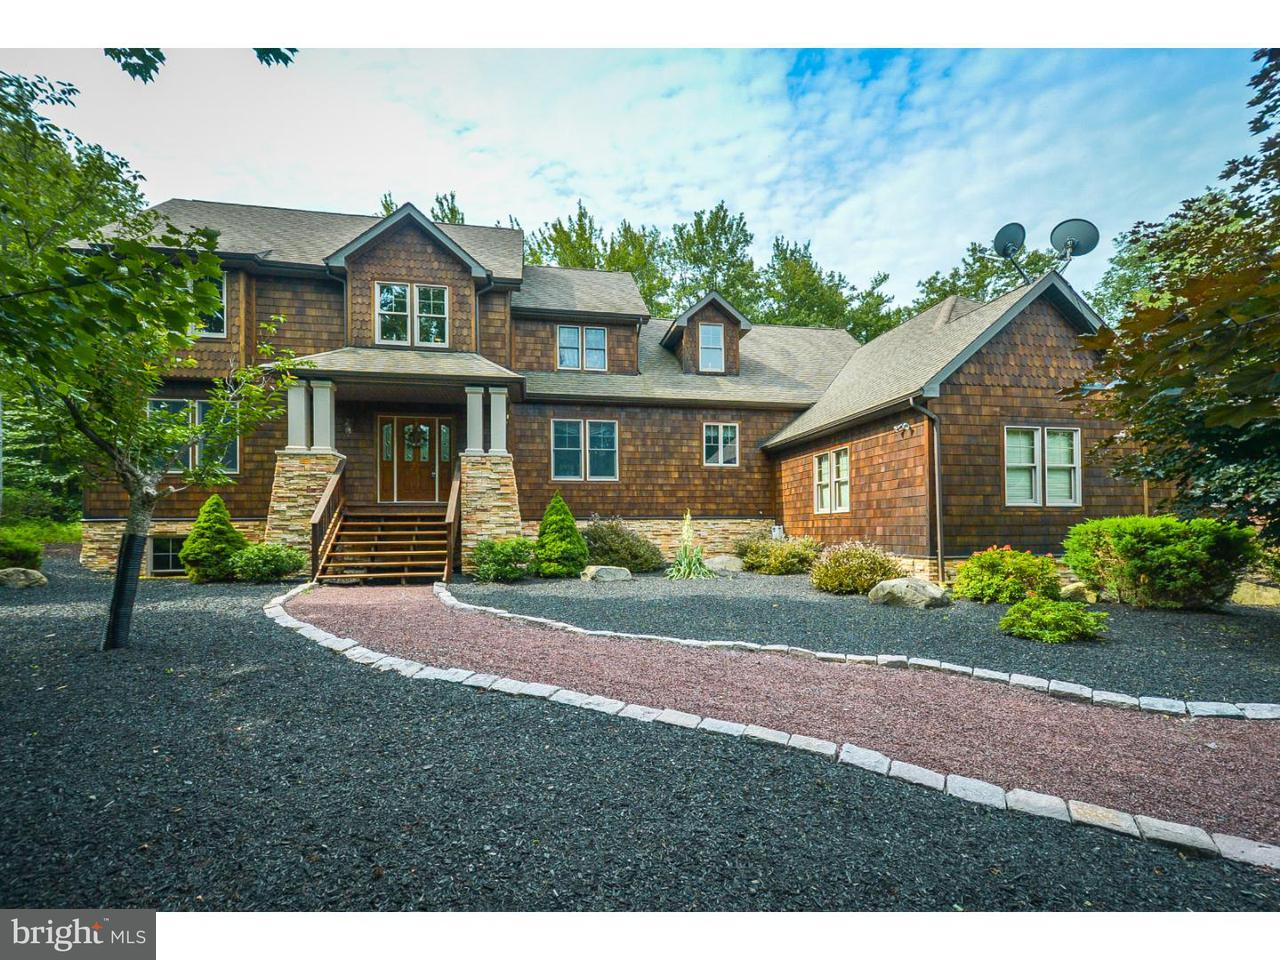 Single Family Home for Sale at 48 WATAWGA WAY W Gouldsboro, Pennsylvania 18424 United States